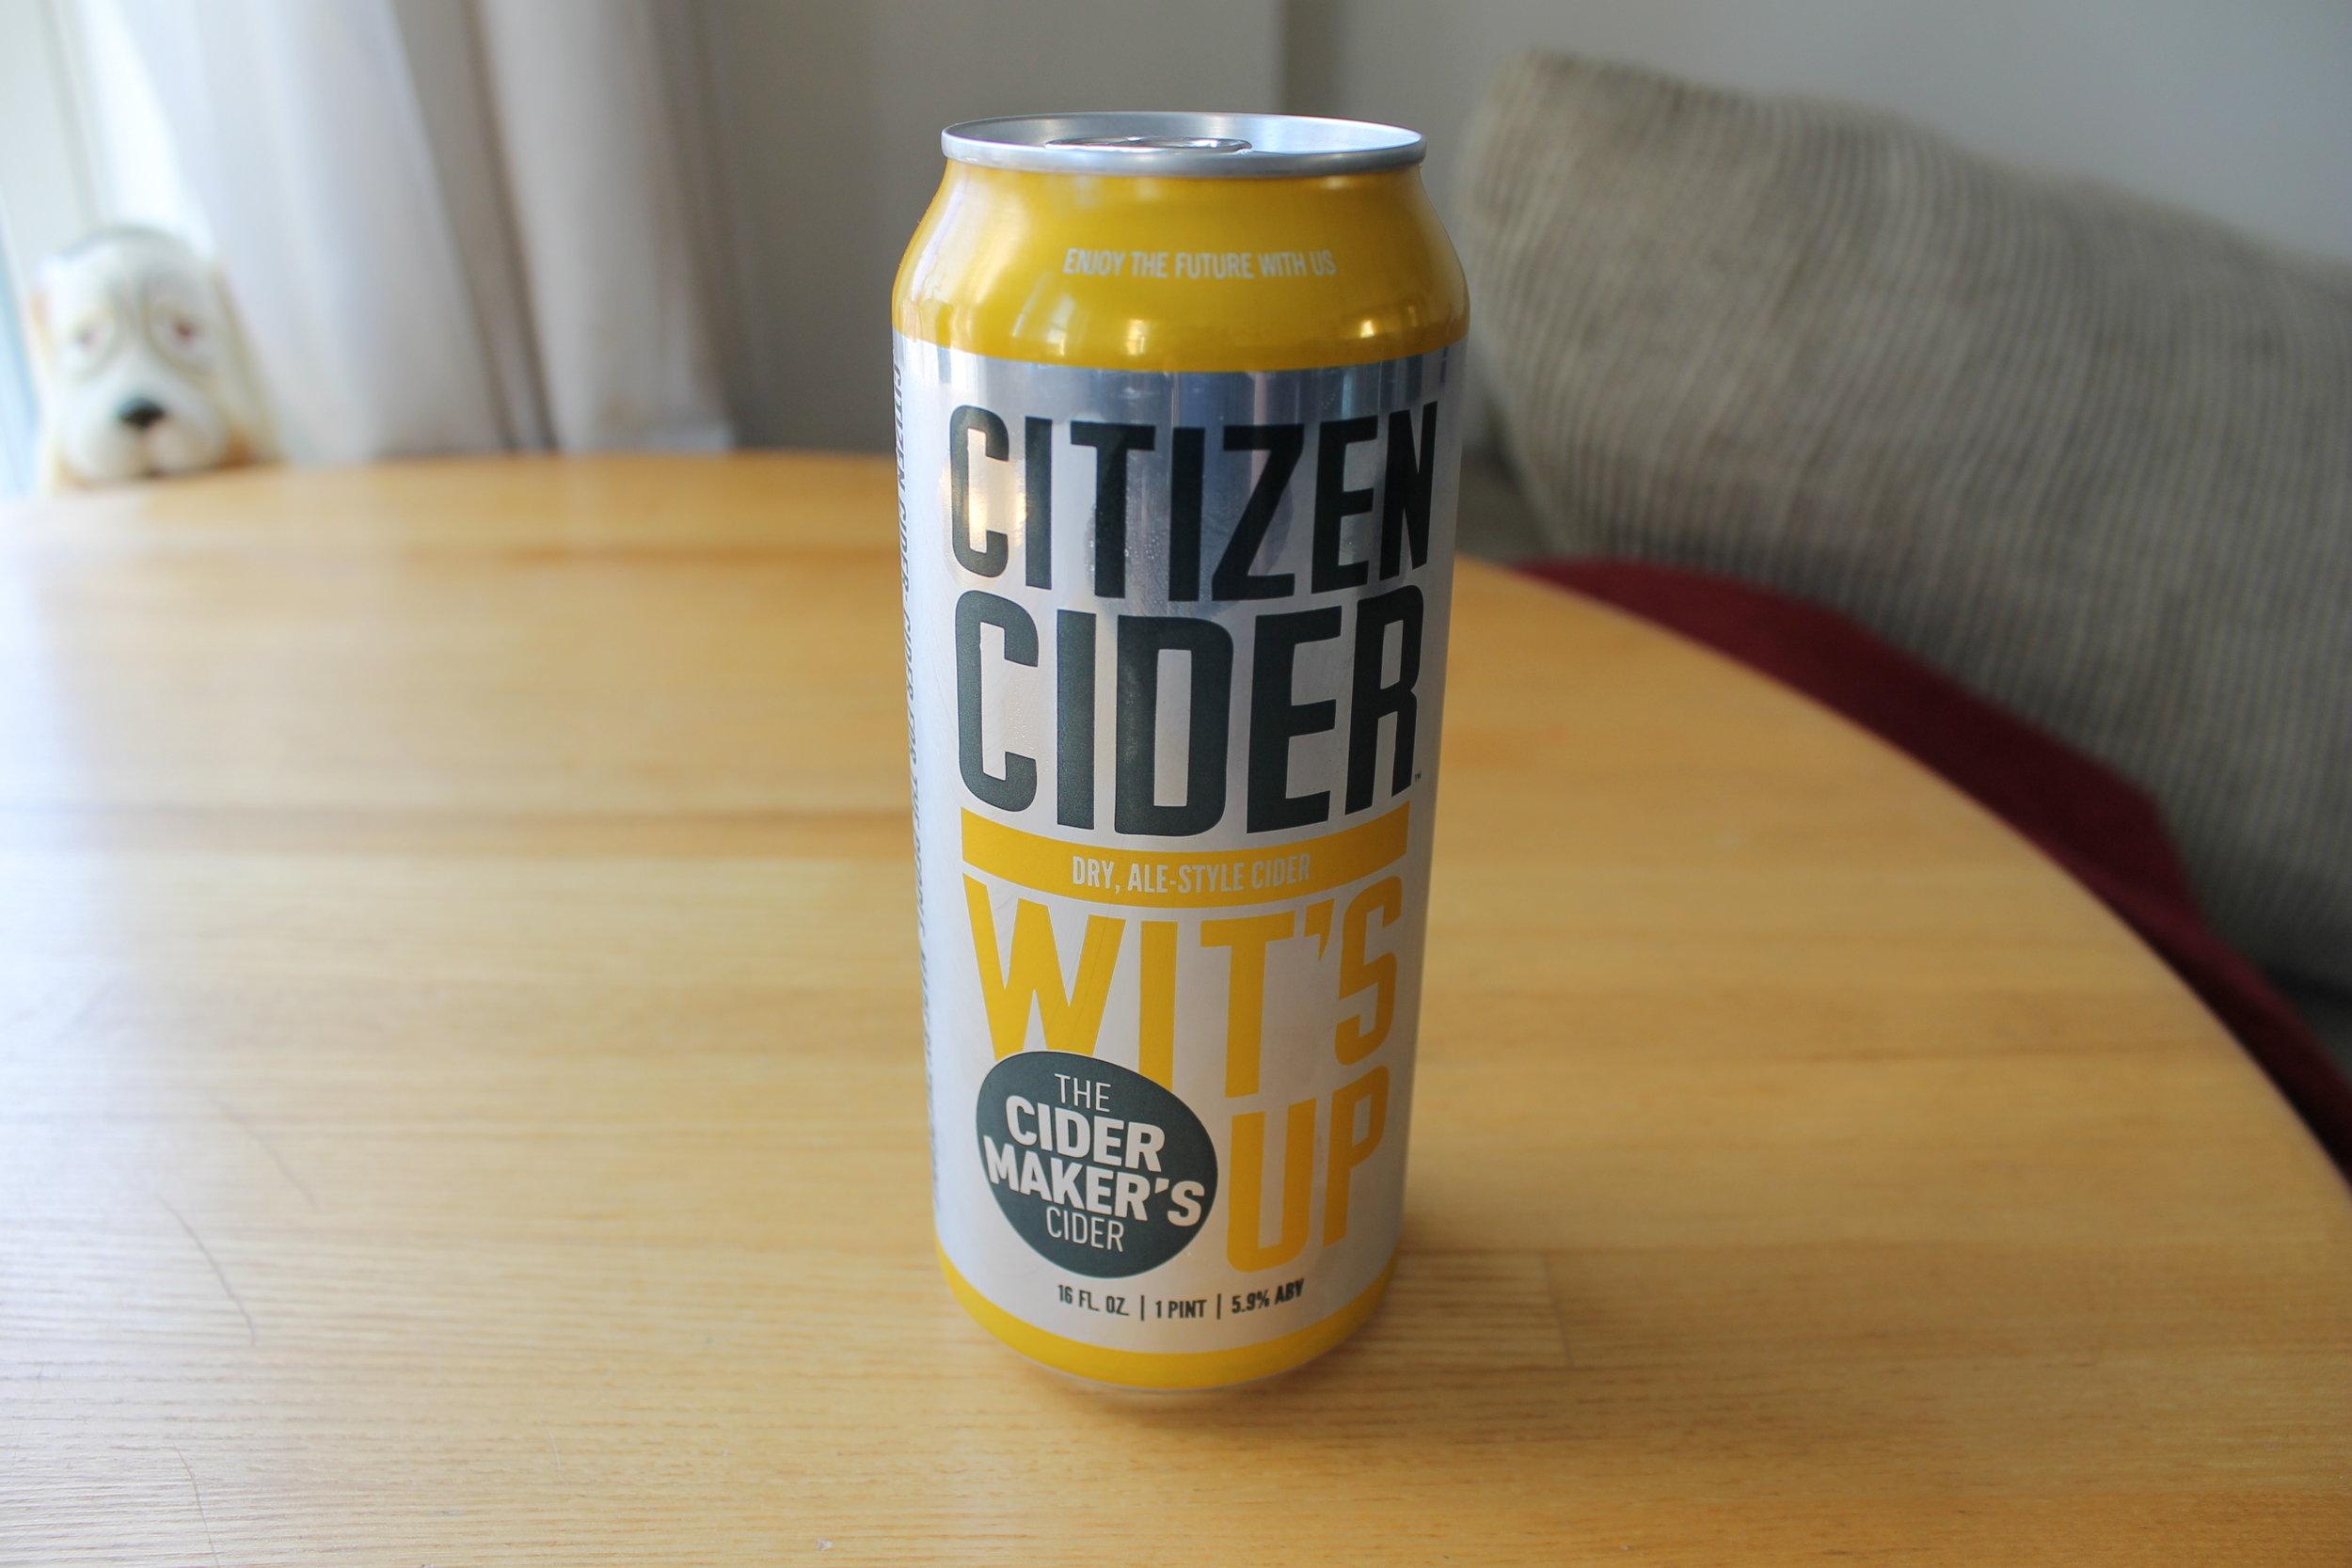 Citizen Cider: Wit's Up